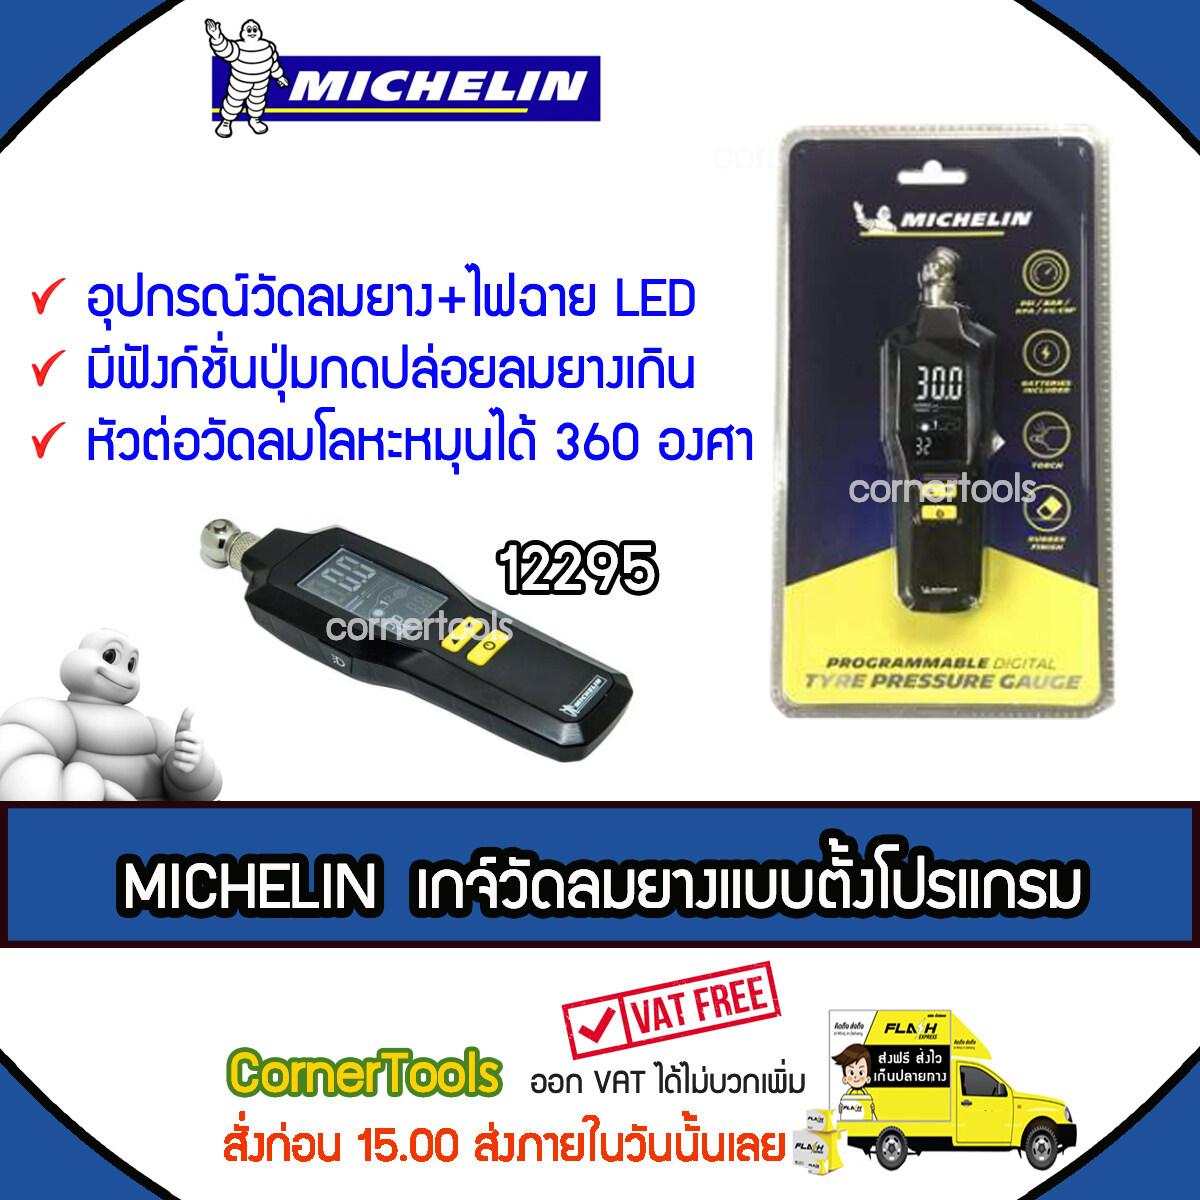 Michelin เกจ์วัดลมยางแบบตั้งโปรแกรม รุ่น 12295 Programmable Digital Tyre Pressure Gauge ***ส่งฟรีแฟลช สั่งก่อนบ่ายสามส่งภายในวัน***.